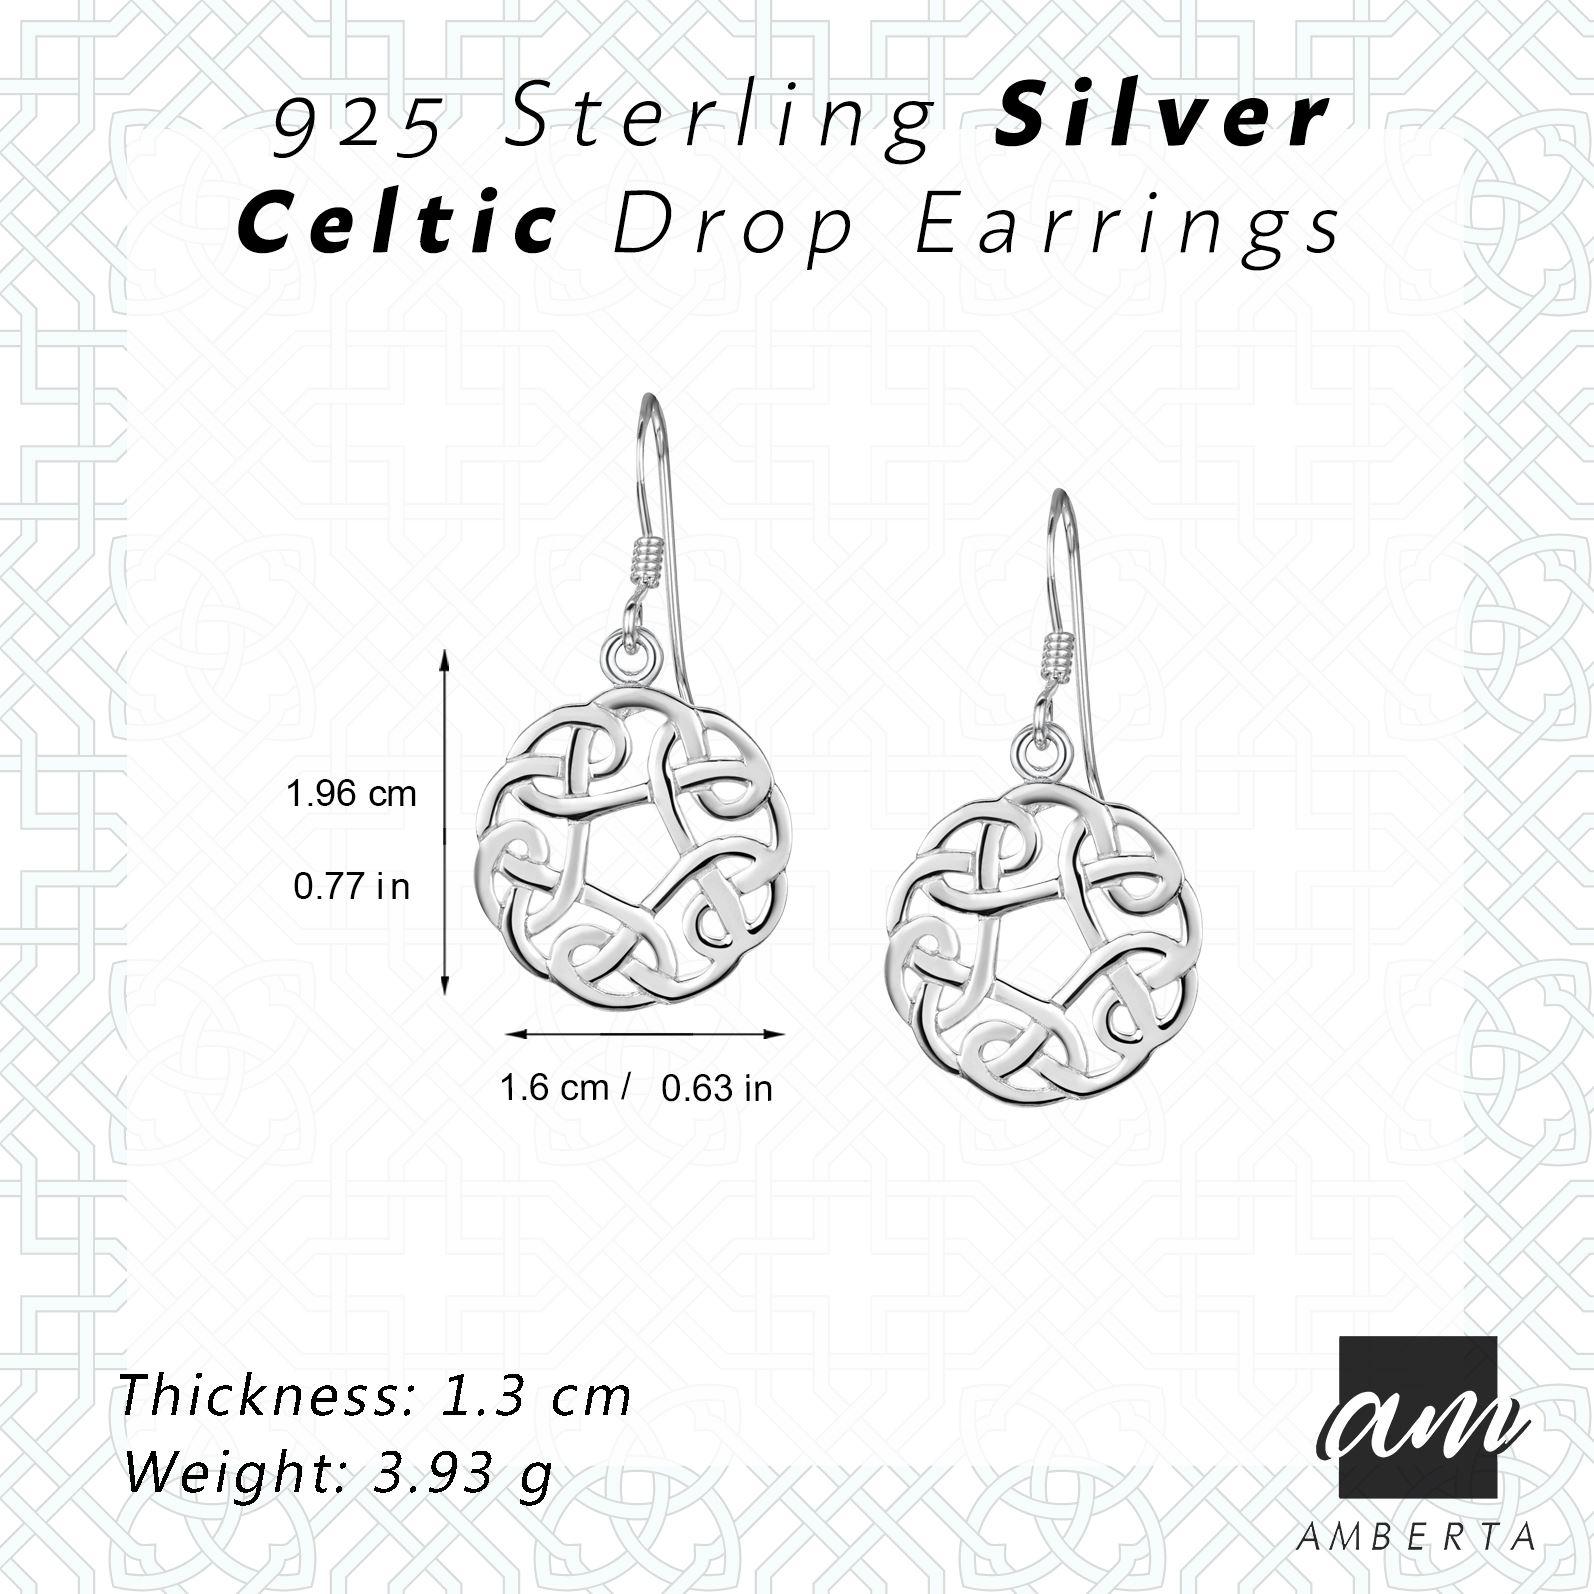 Amberta-925-Sterling-Silver-Celtic-Knot-Earrings-for-Women-Irish-Design miniature 21